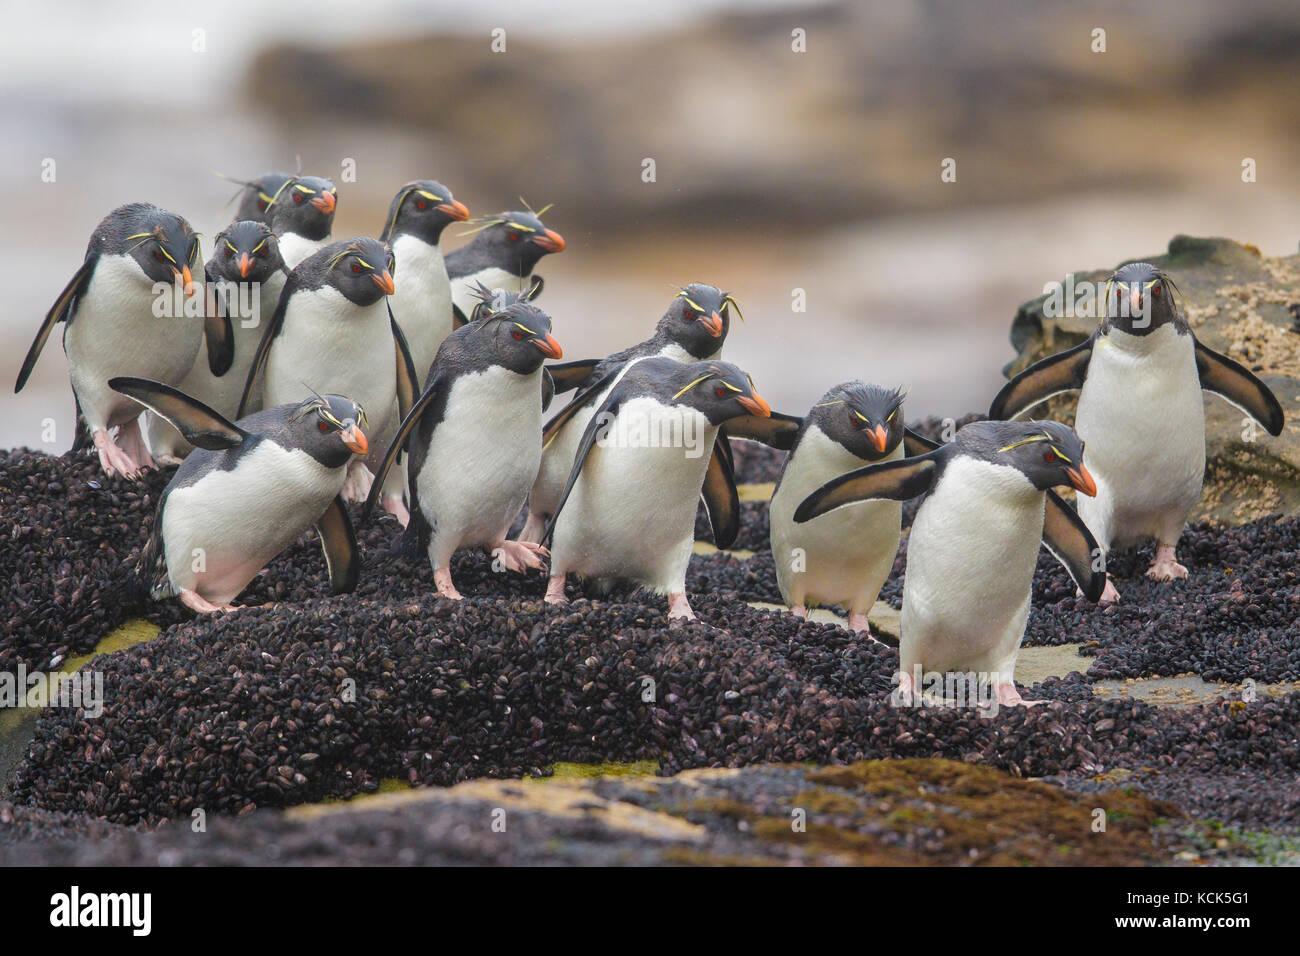 Rockhopper Penguin (Eudyptes chrysocome) along the shoreline in the Falkland Islands. - Stock Image